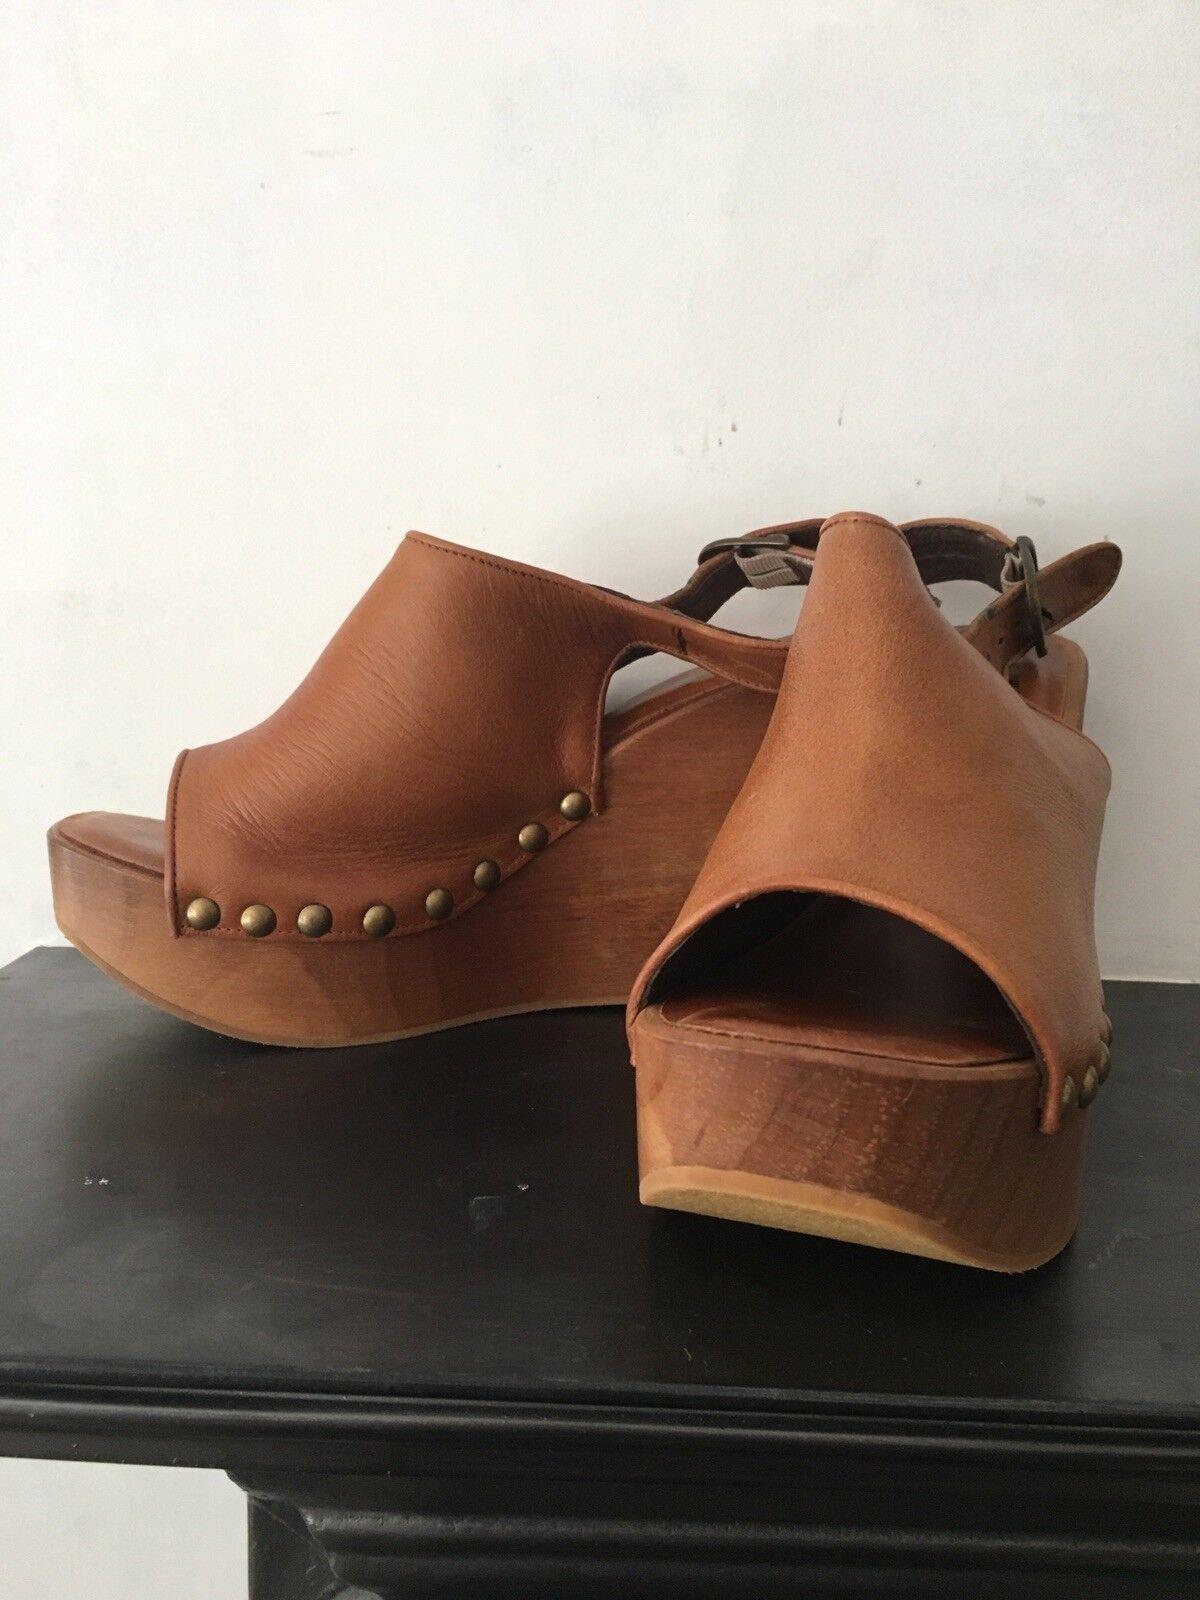 Jeffery Campbell 'Clog' Wedge Tan leather schuhe UK UK UK 41 8 Brand New a977e2